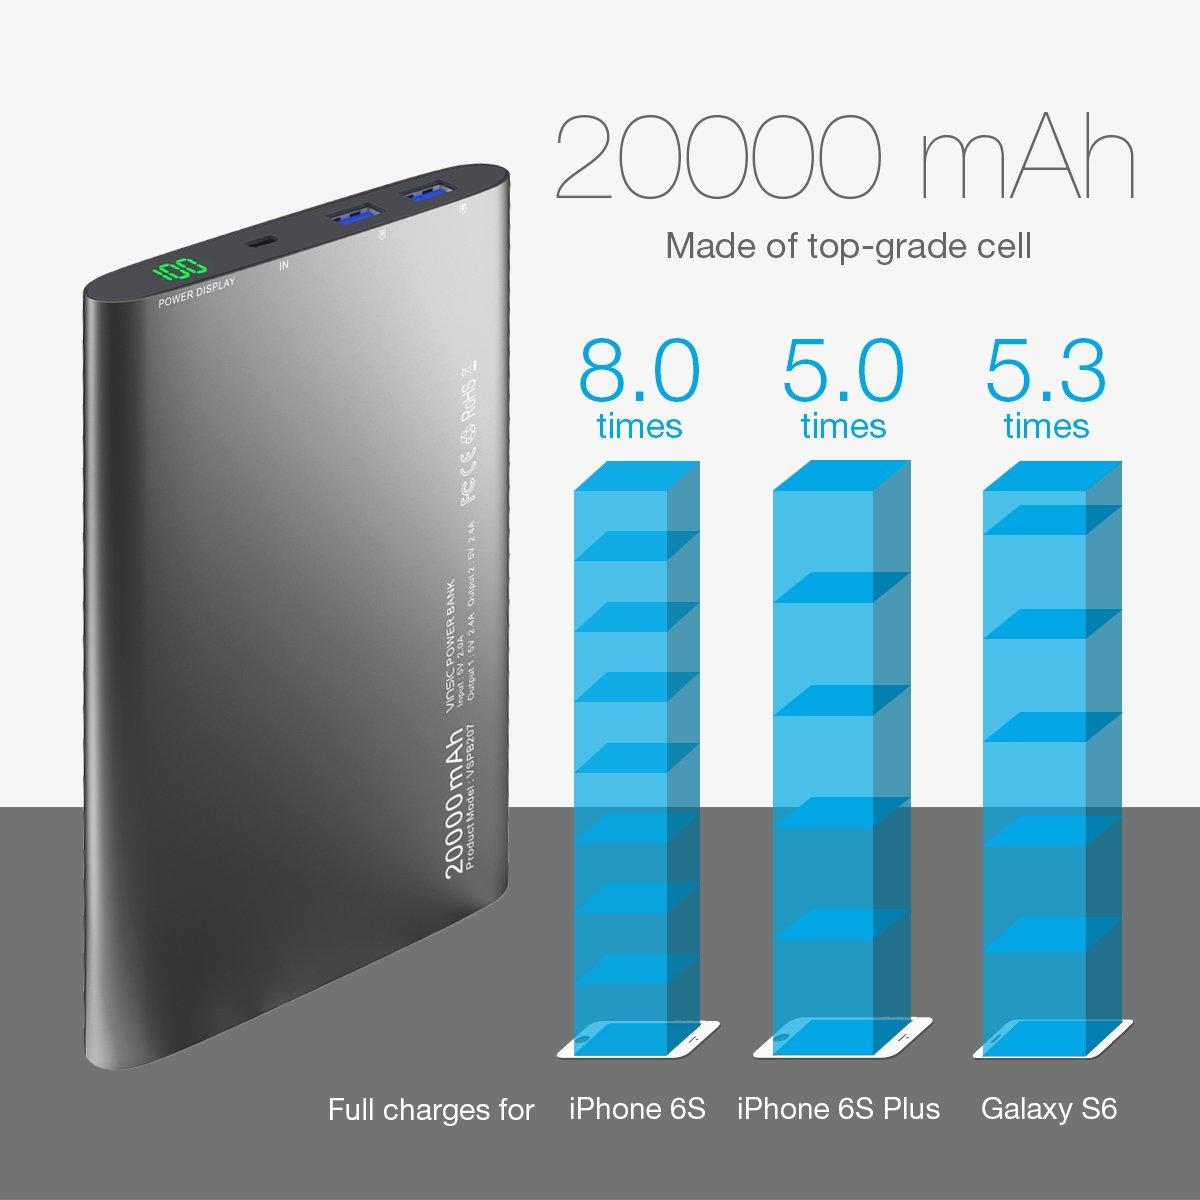 Vinsic Power Bank, 20000mAh Ultra Slim Power Bank: Amazon.co.uk ...